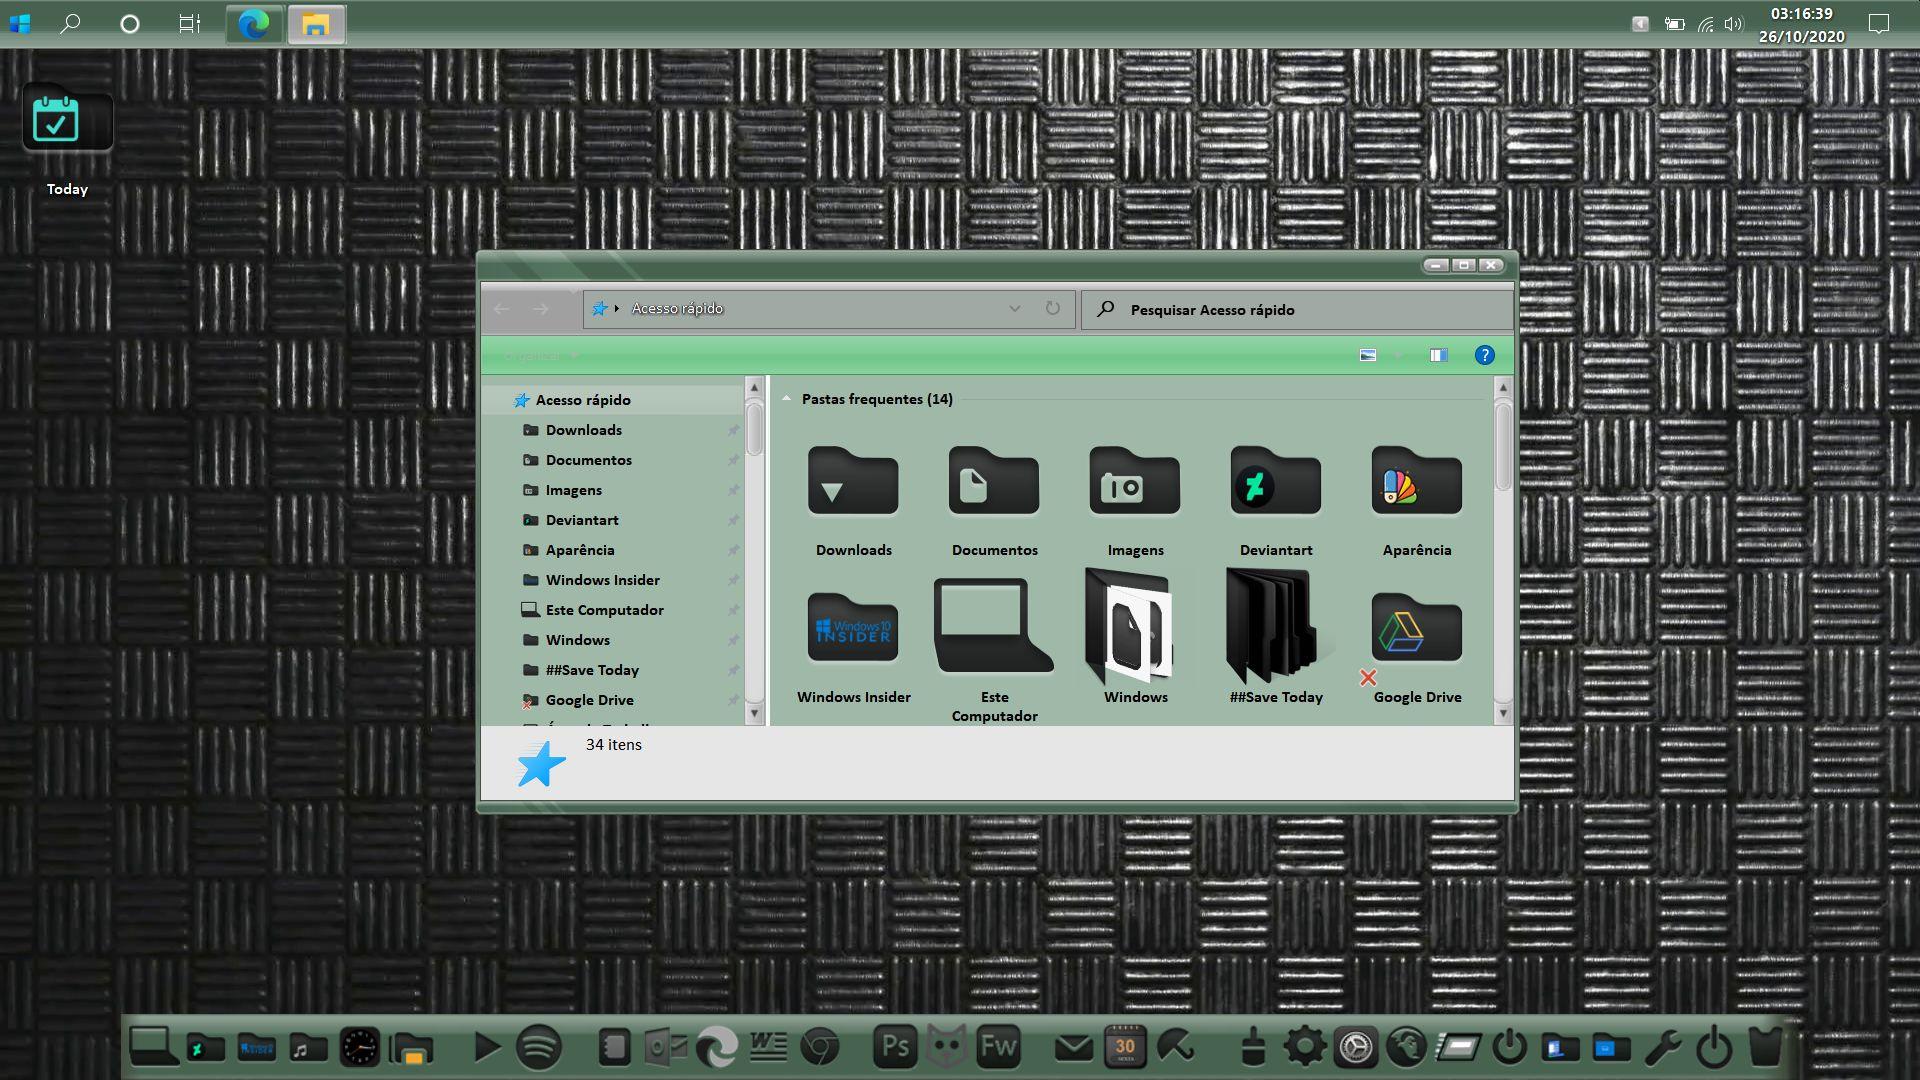 Desktop tonight - 20 10 26